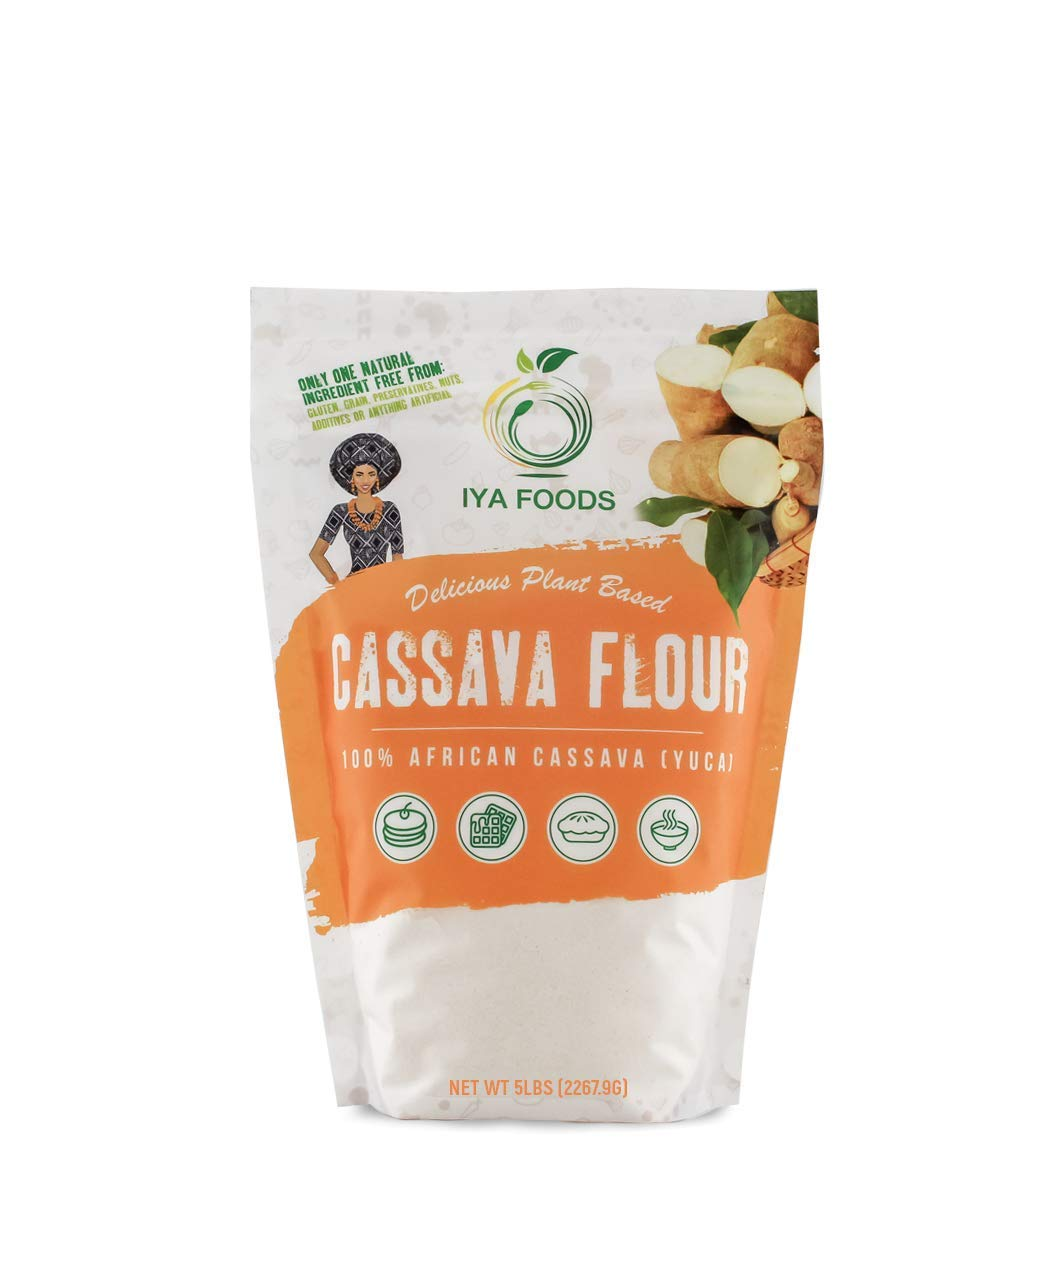 Iya Foods Premium Cassava Flour 5 lb. bags, Gluten-Free, Kosher certified, Paleo. by Iya Foods